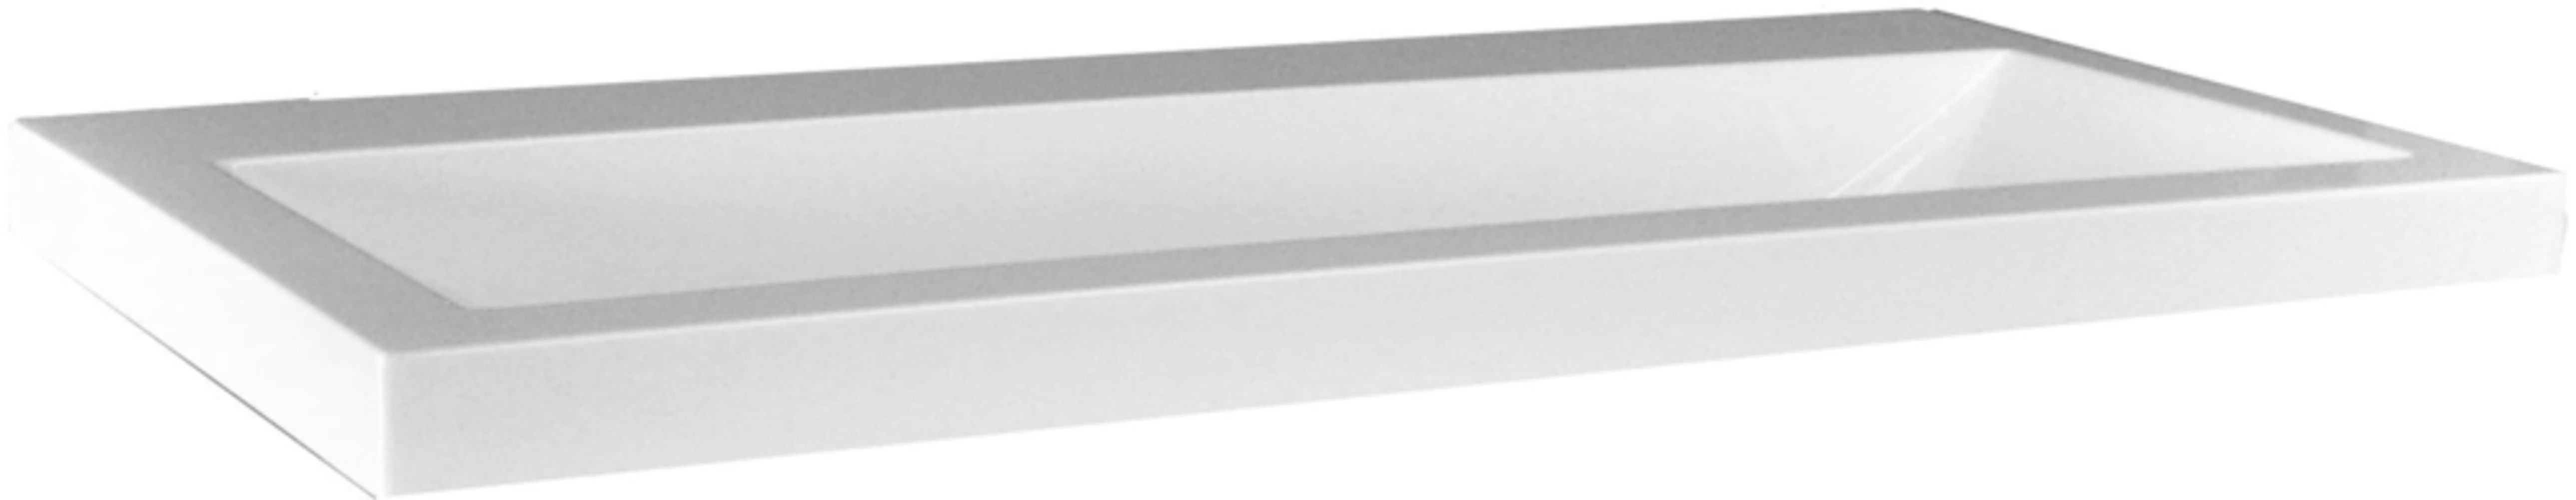 wiesbaden wastafel 80cmx36cm zonder kraangat wit megadump